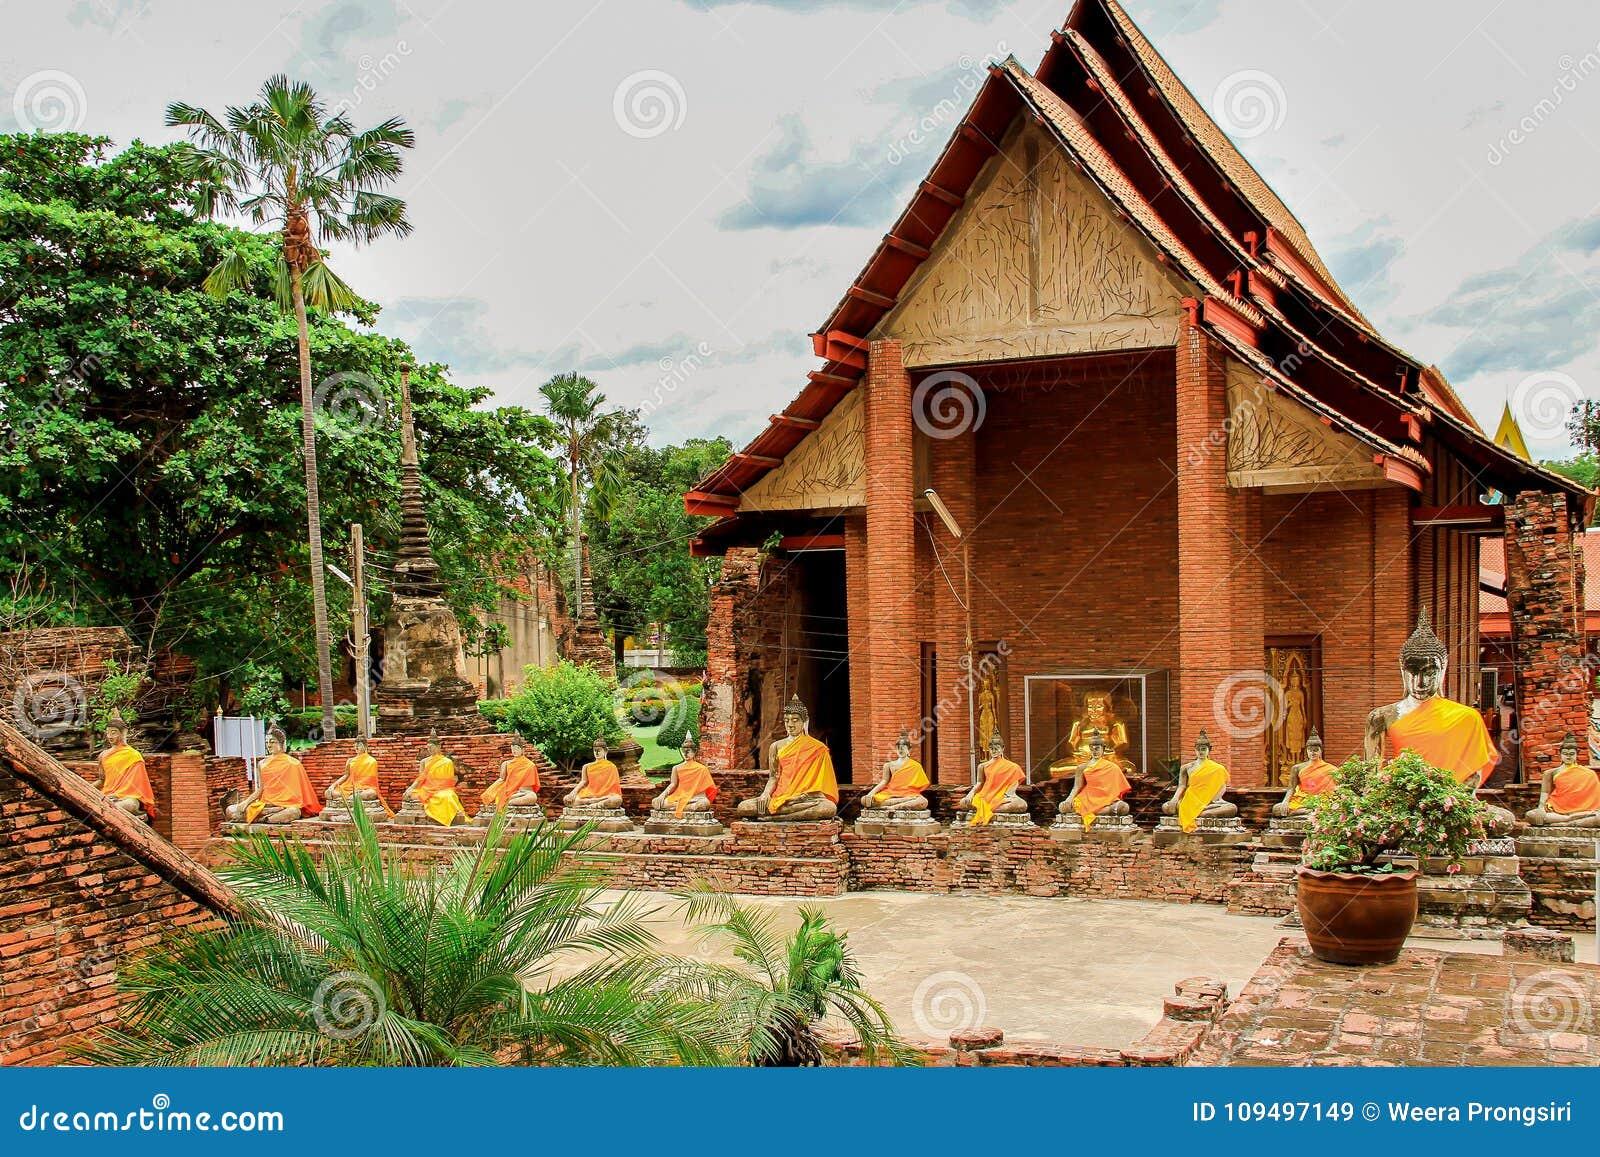 Thailand Asien, Ayuthaya, Wat Yai Chai Mongkhon, East Asia